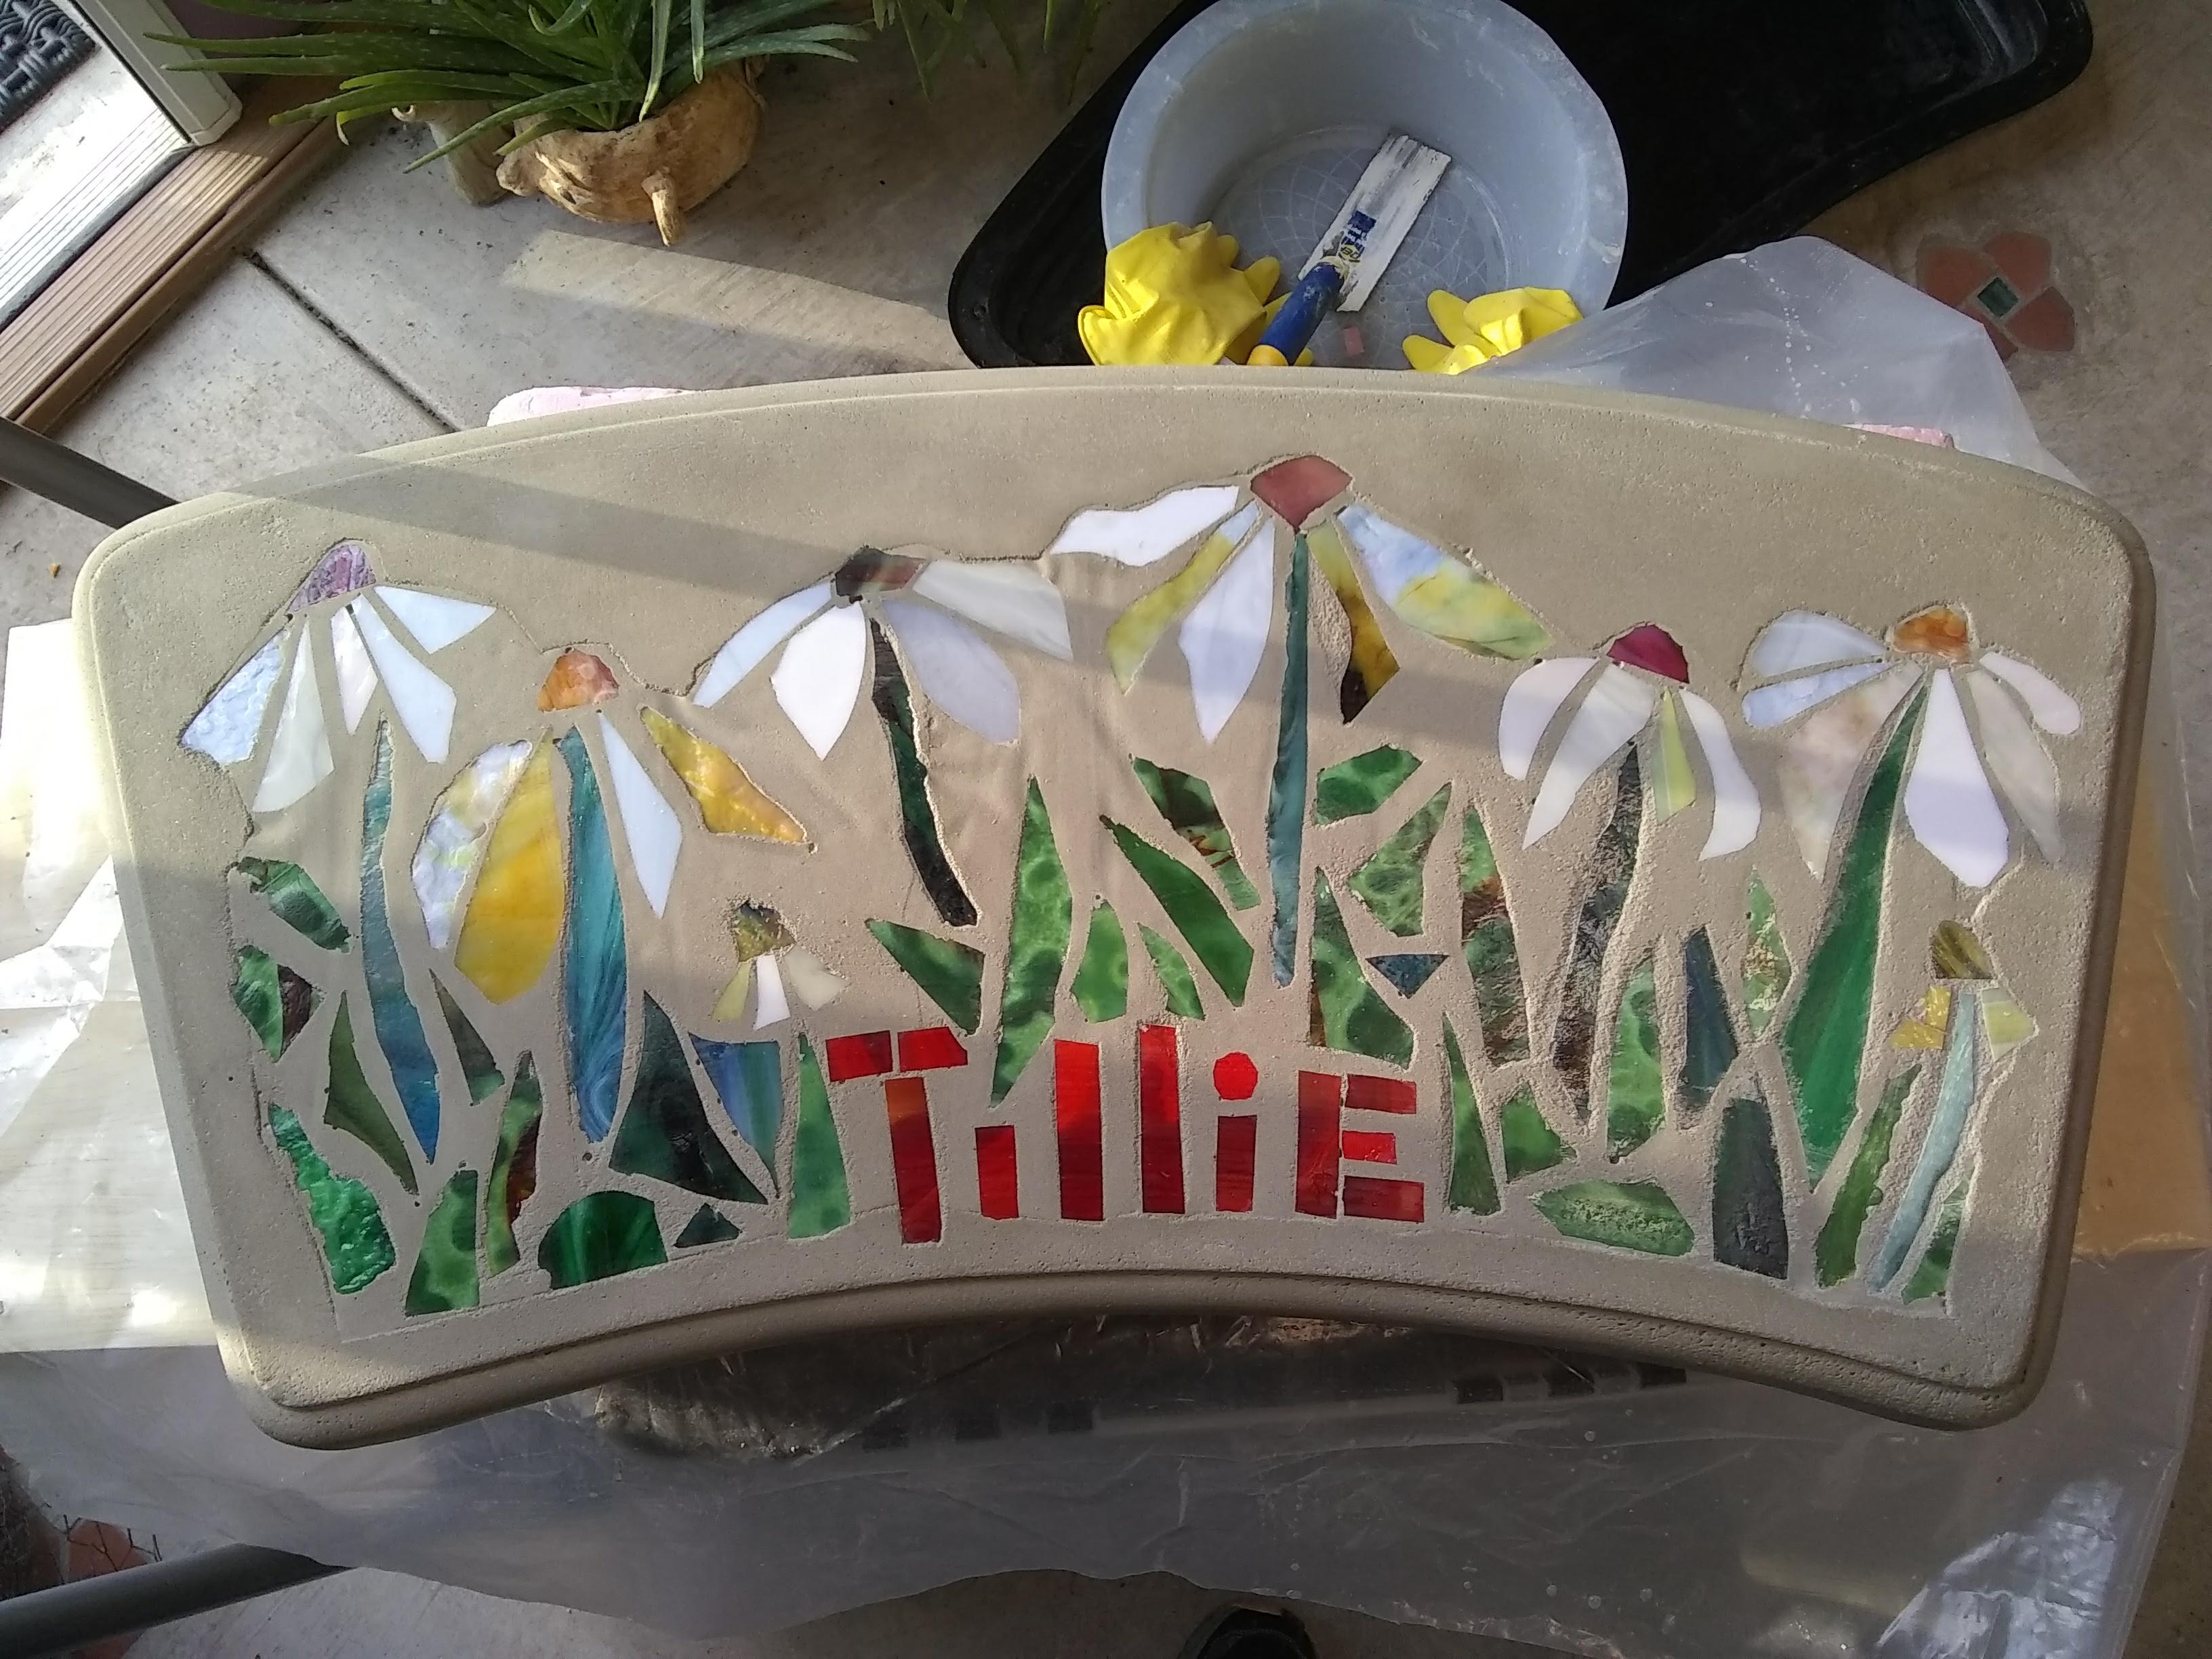 Tillie's Garden mosaic bench top by Jeannette Brossart, cast concrete glass mosaic, private commission